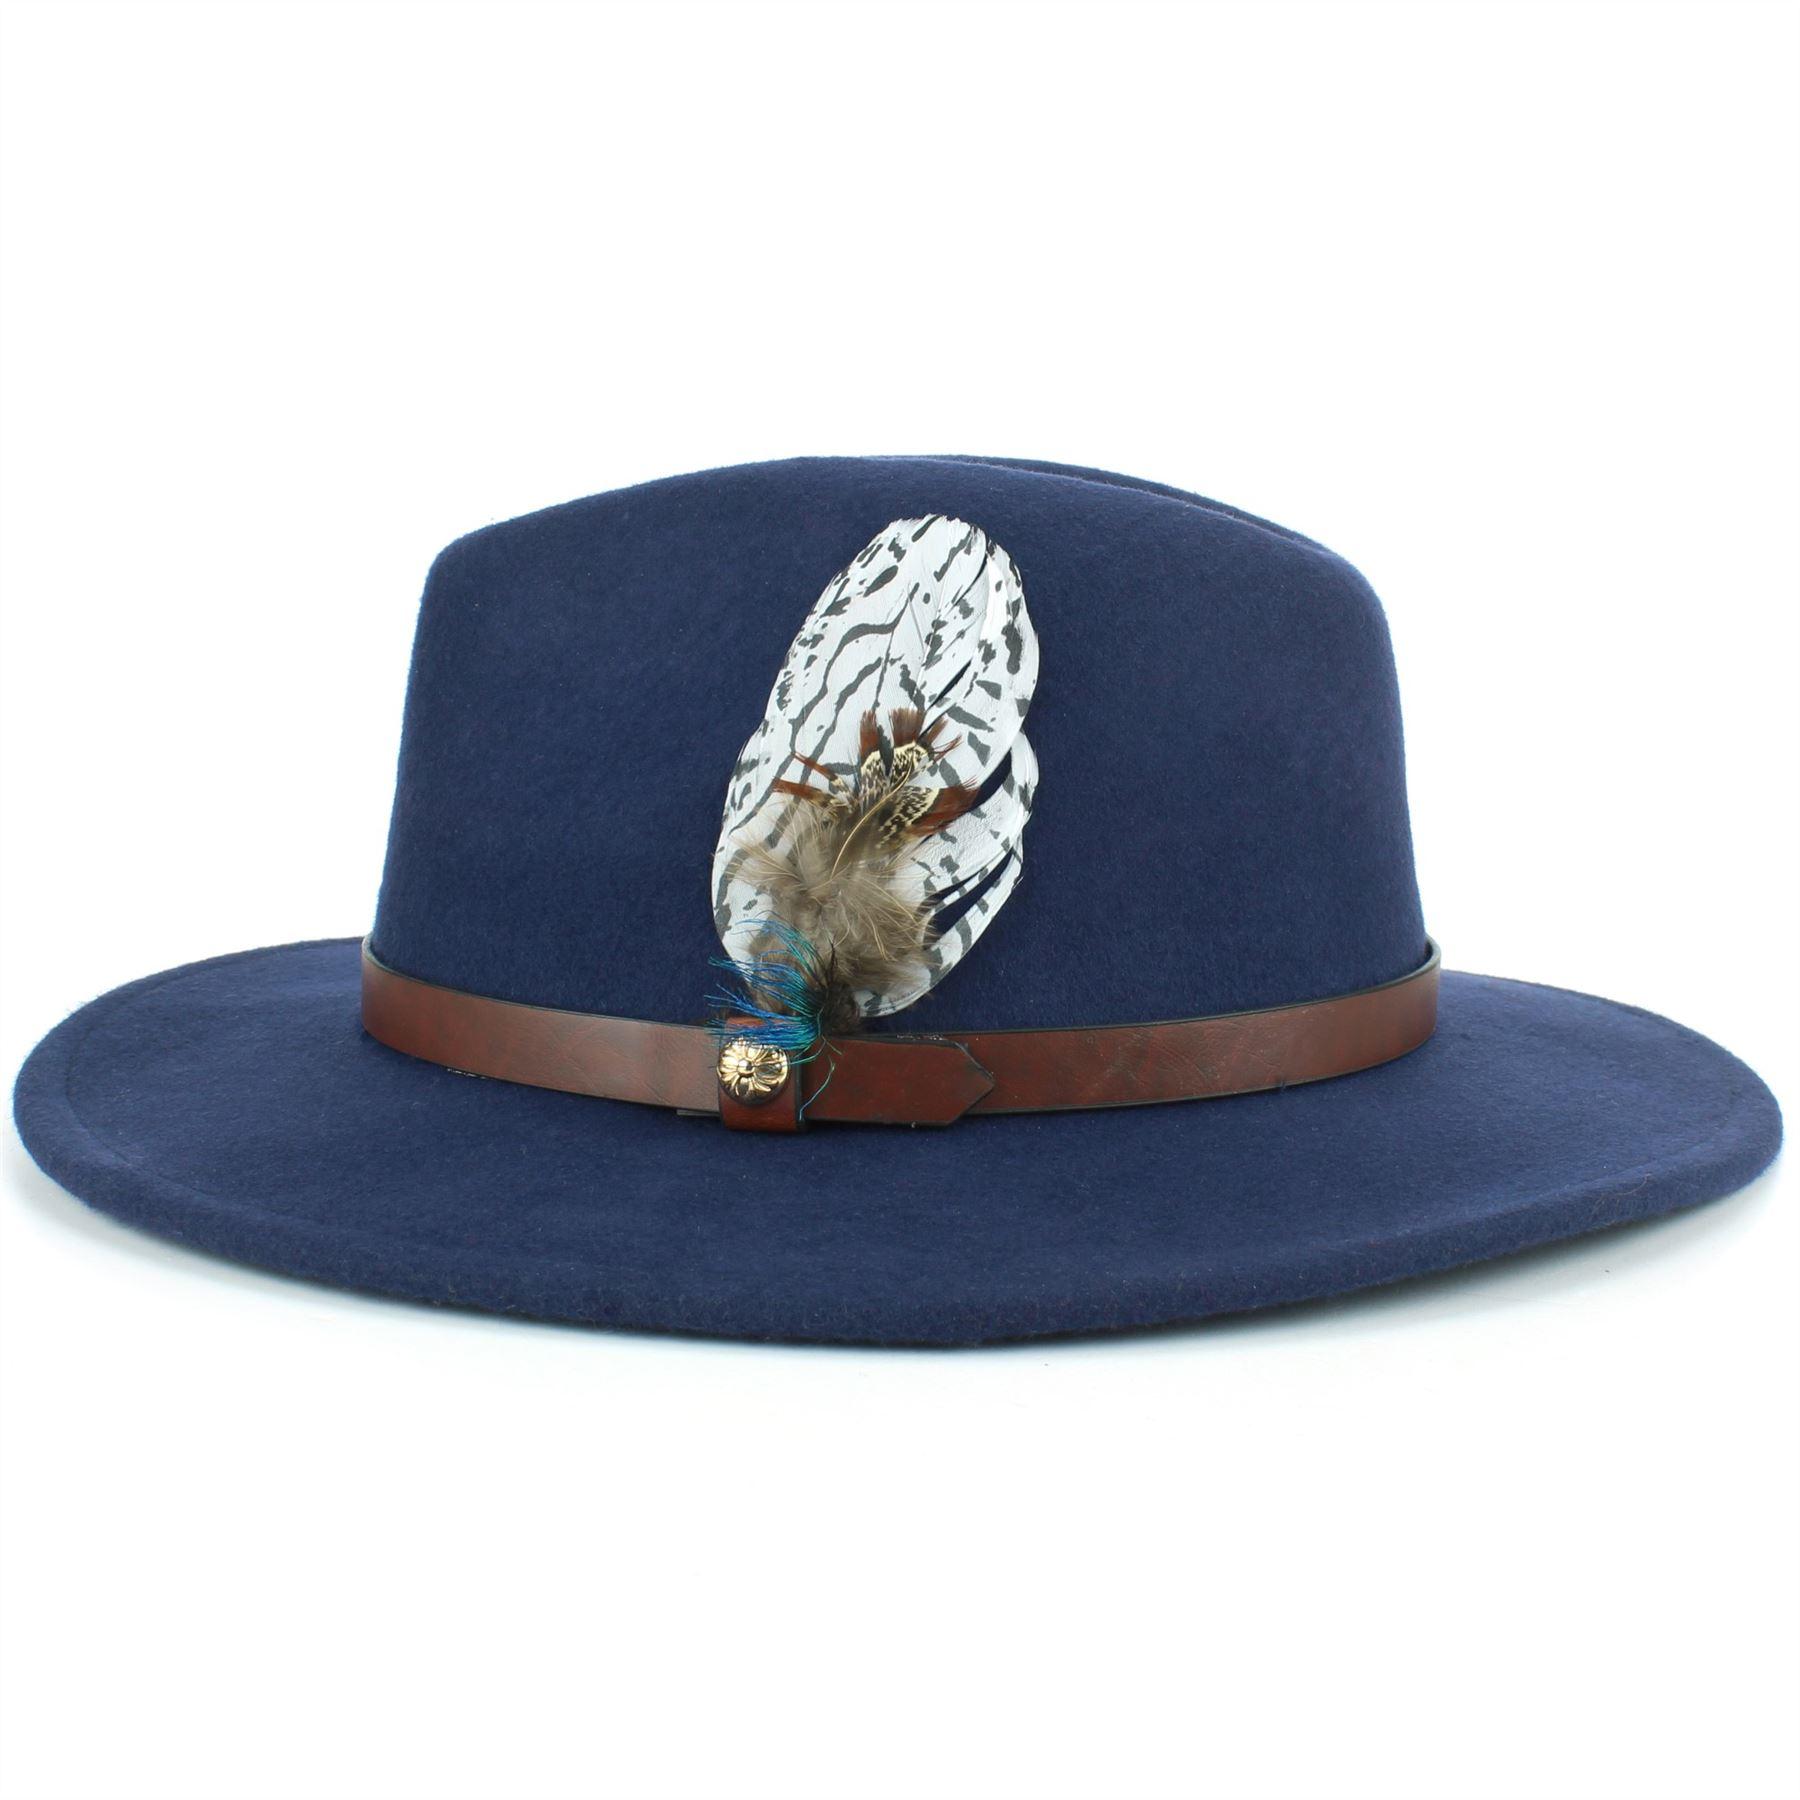 Fedora-Hat-Wool-Felt-Hawkins-Feather-Band-Trilby-Ladies-Men-Travel-Brim-Travel thumbnail 12